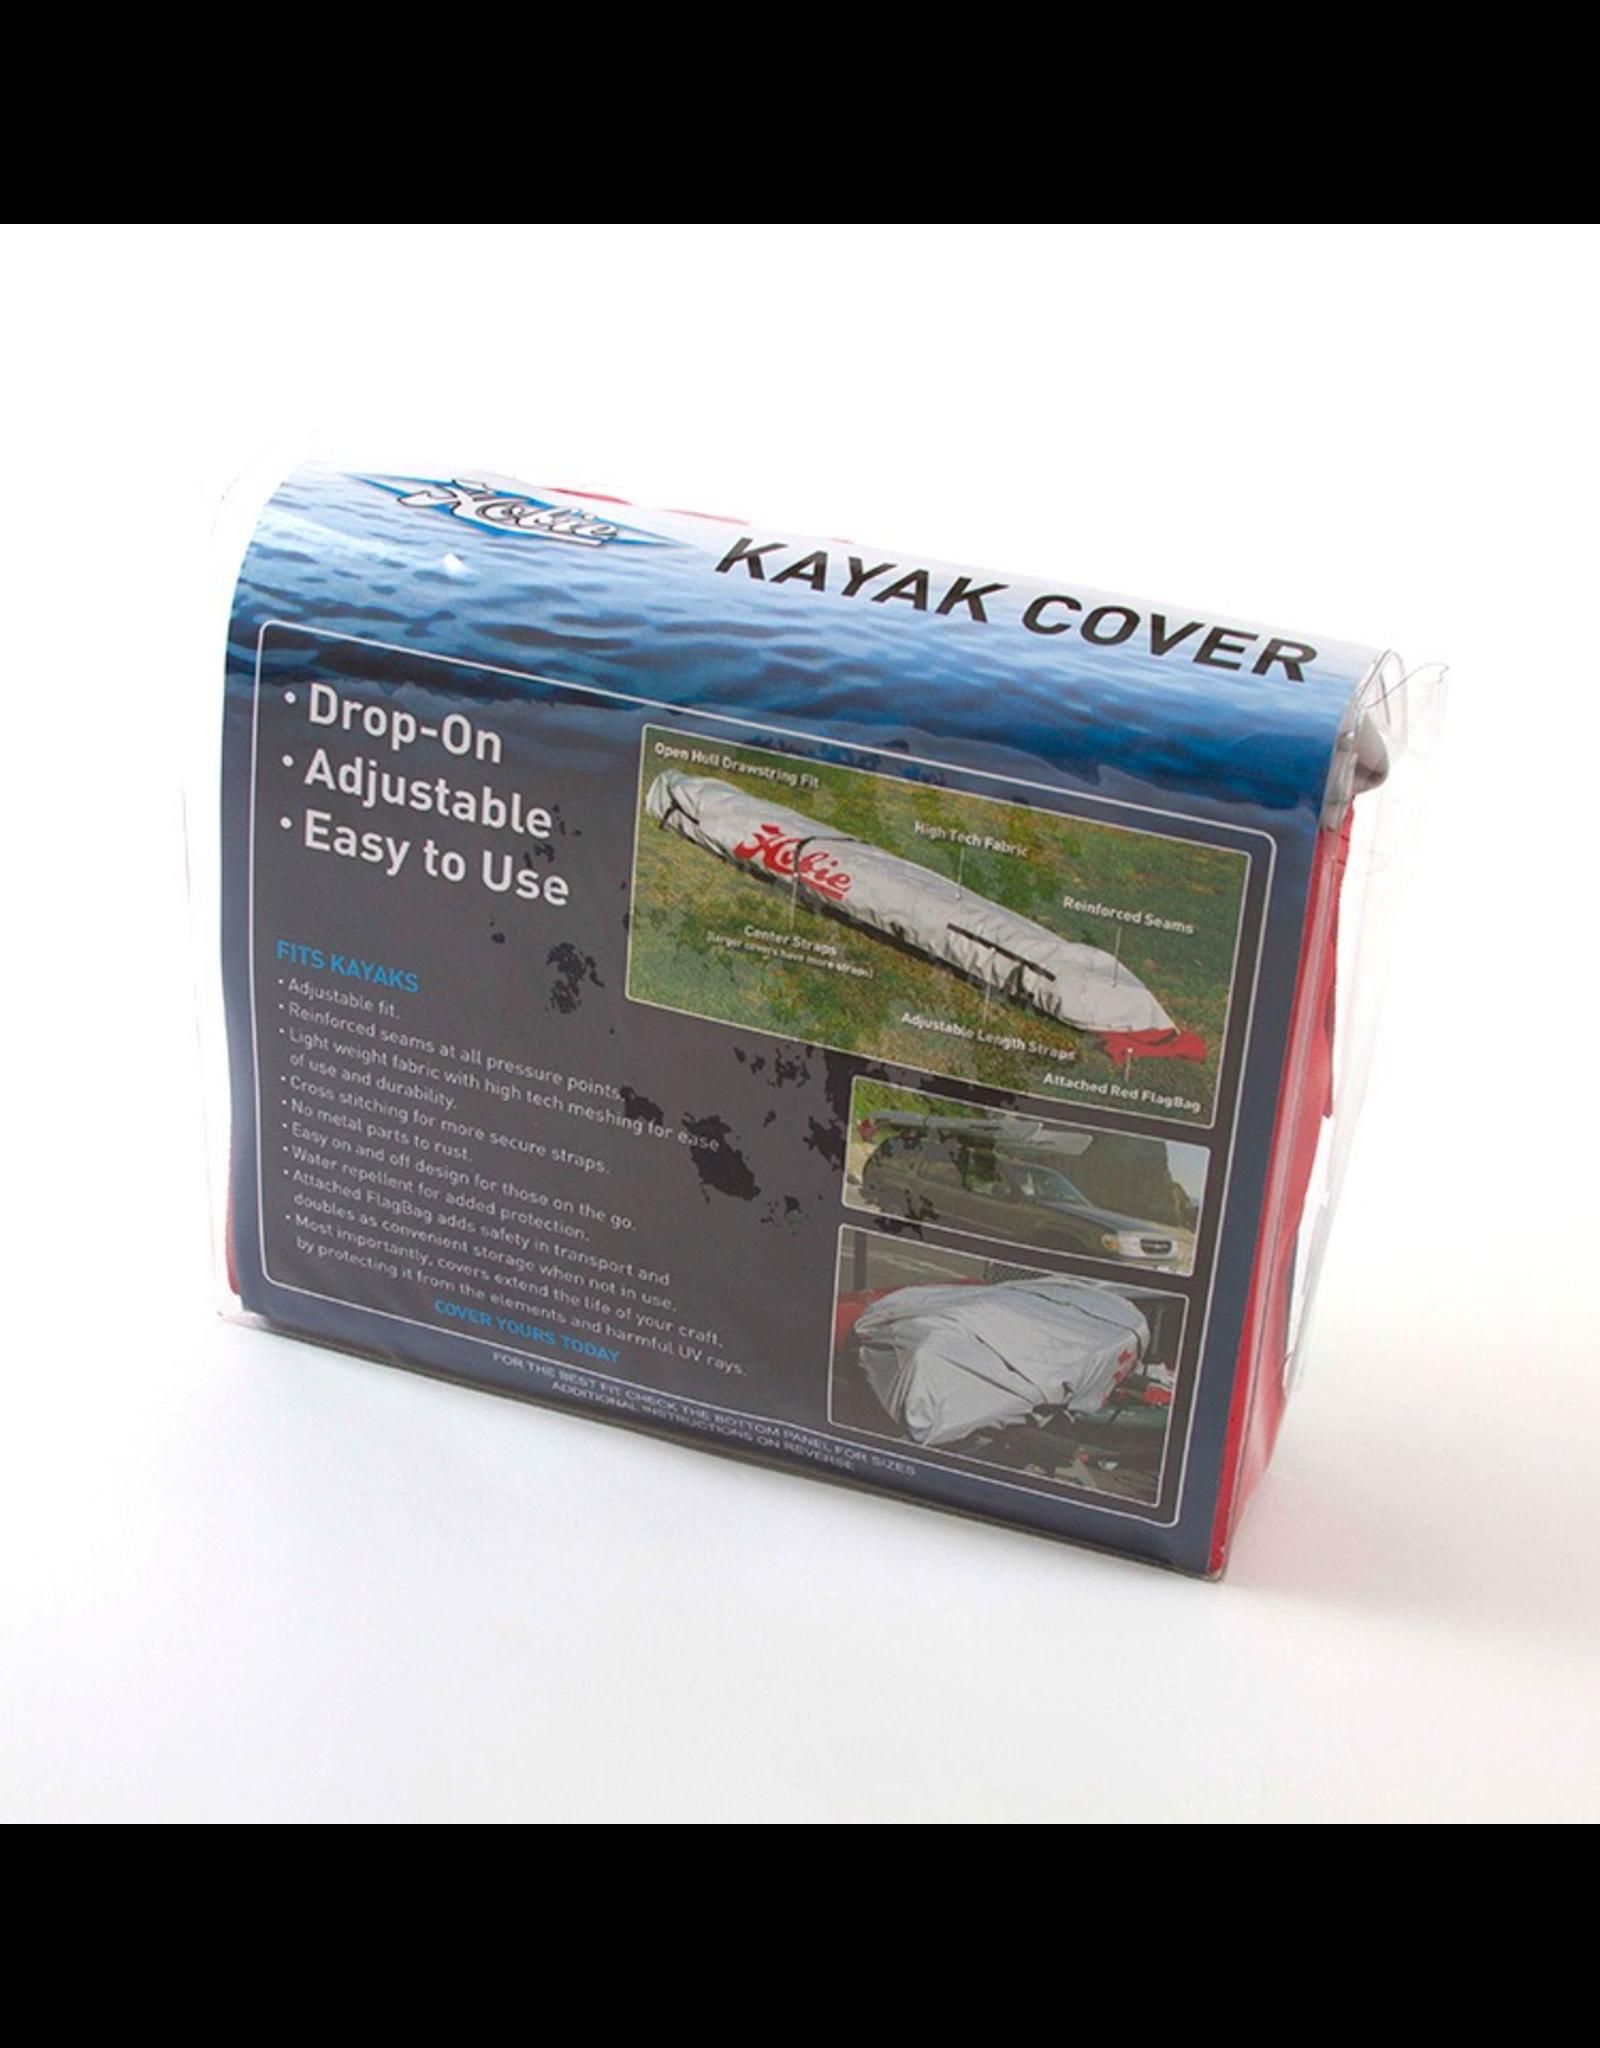 Hobie Hobie Kayak Cover for Hobie Kayaks.  Fits 12'-15' kayaks